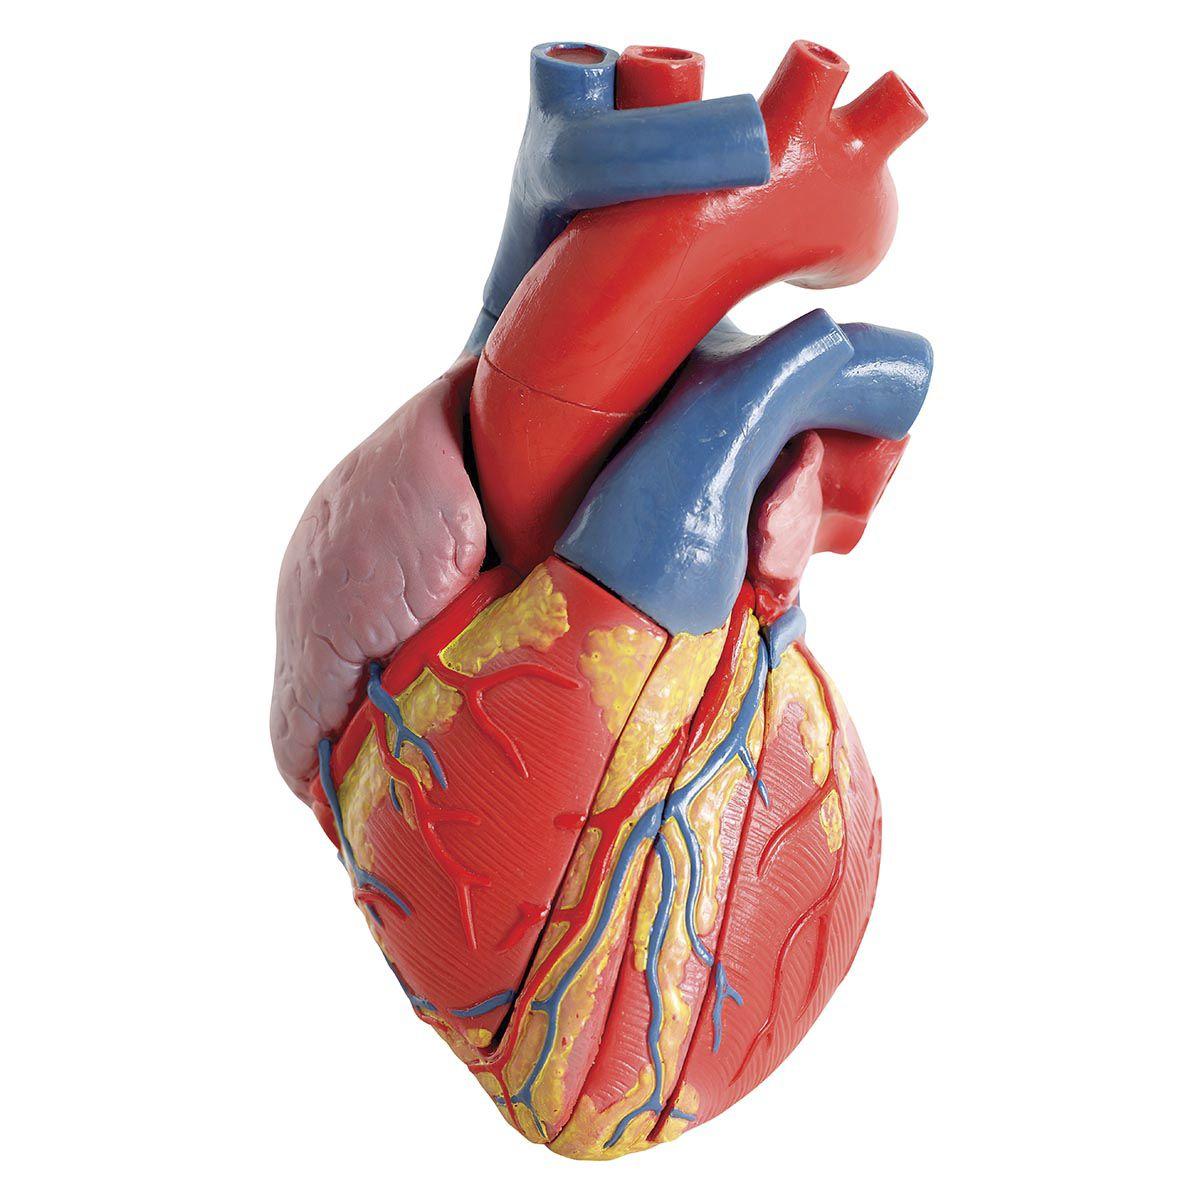 Heart Anatomy Model Image Collections Human Body Anatomy